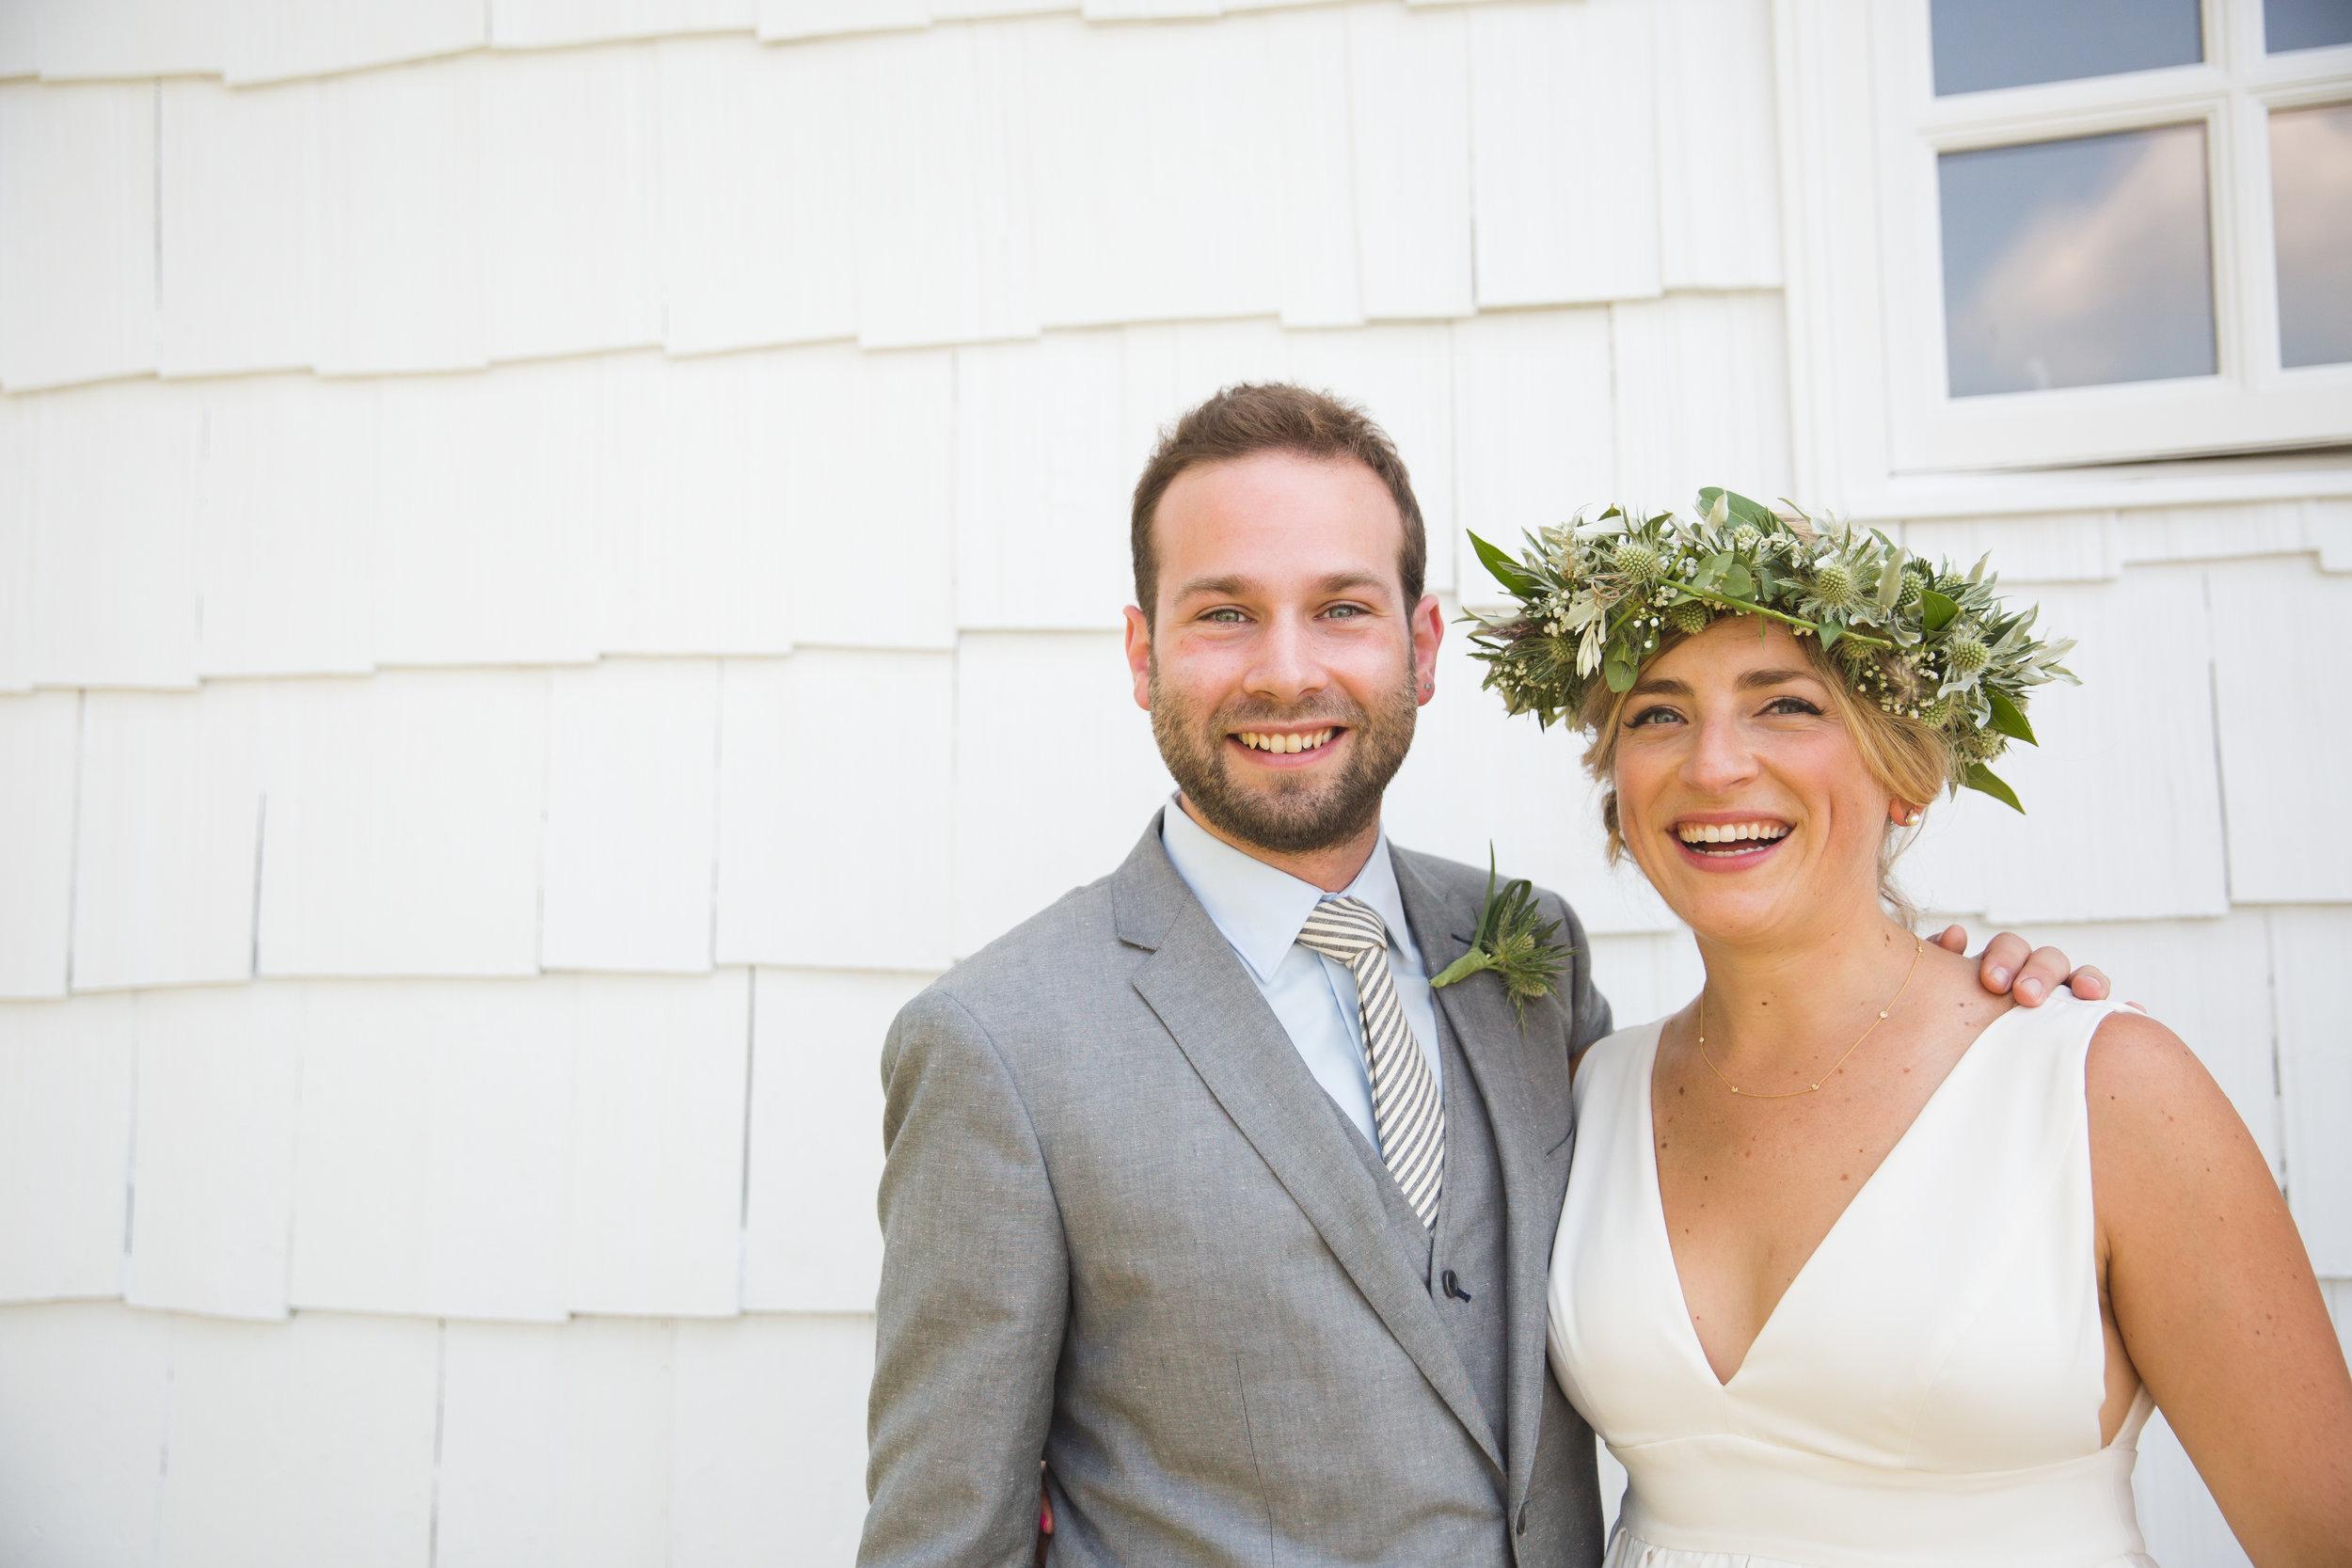 LUCAS POINT WEDDING OLD GREENWICH CONNECTICUT_015.jpg